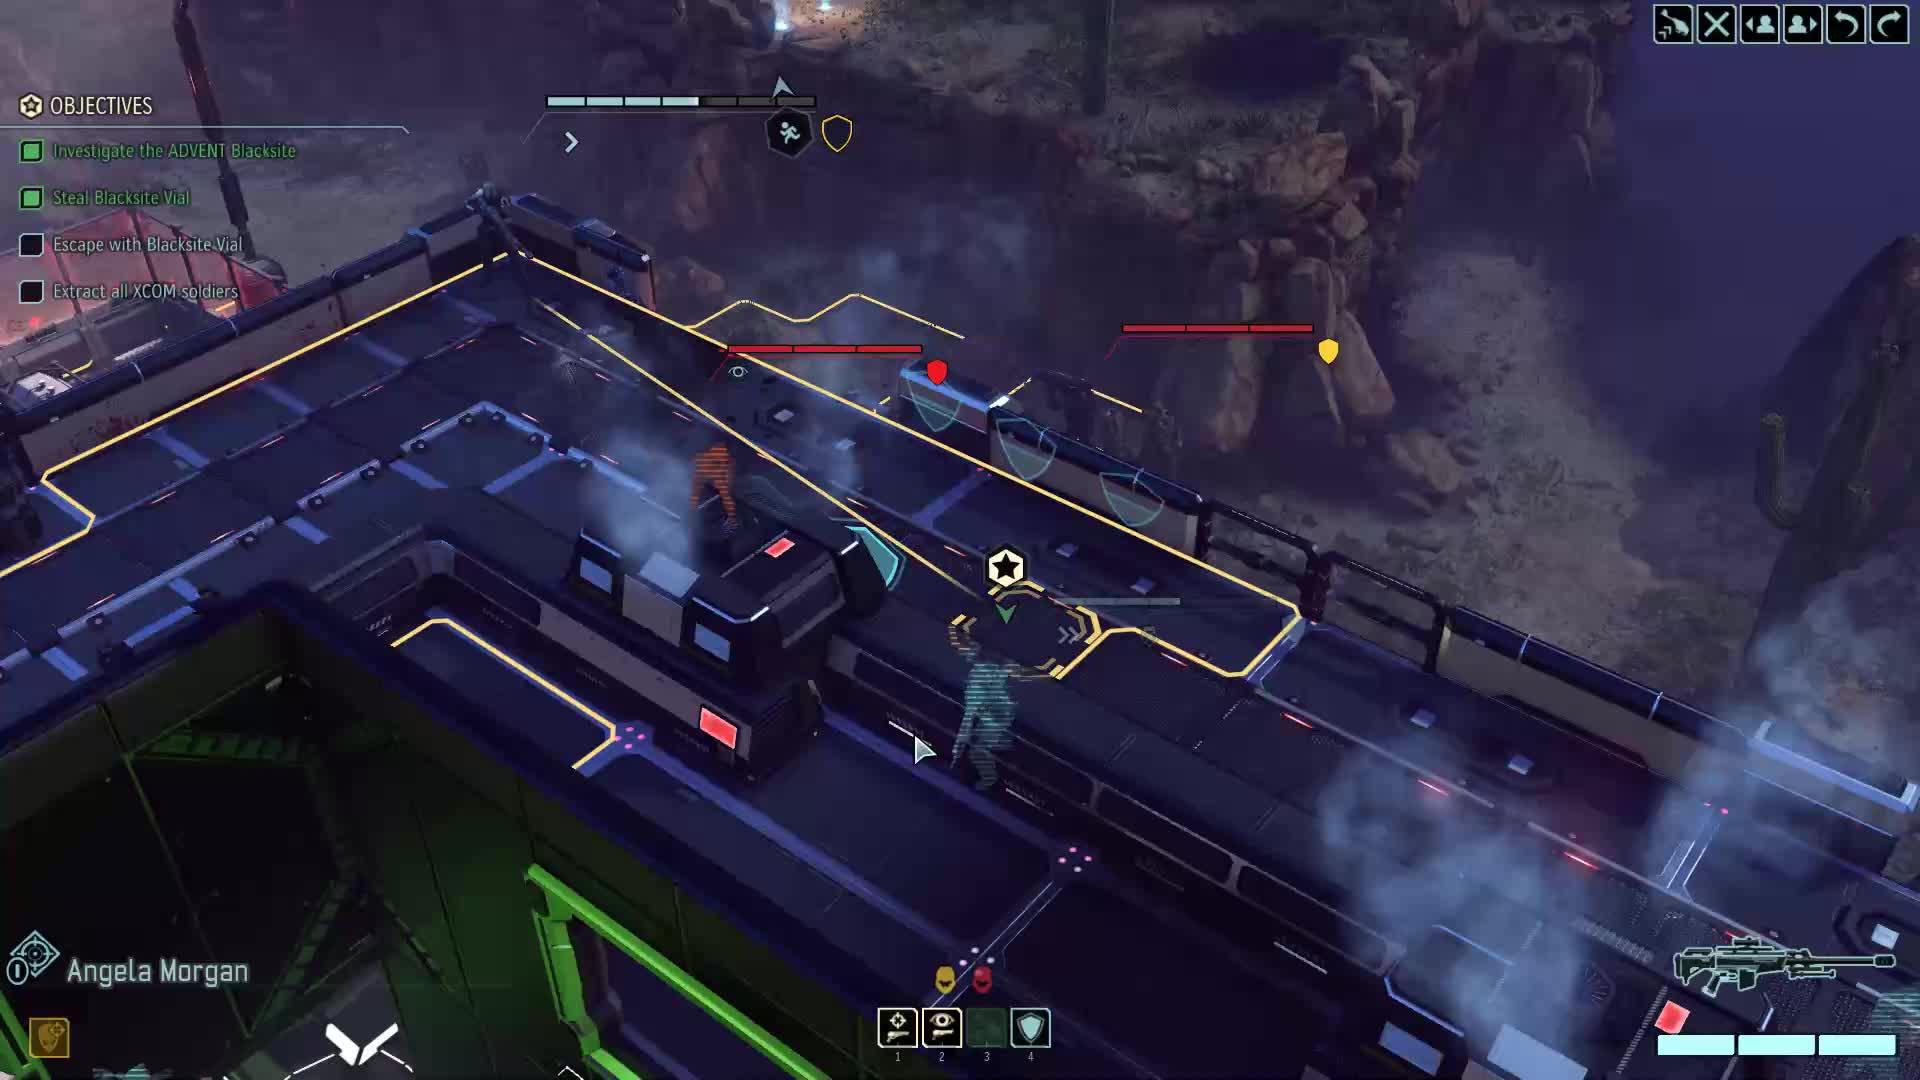 xcom2, XCOM 2 - 100% Pistol GIFs